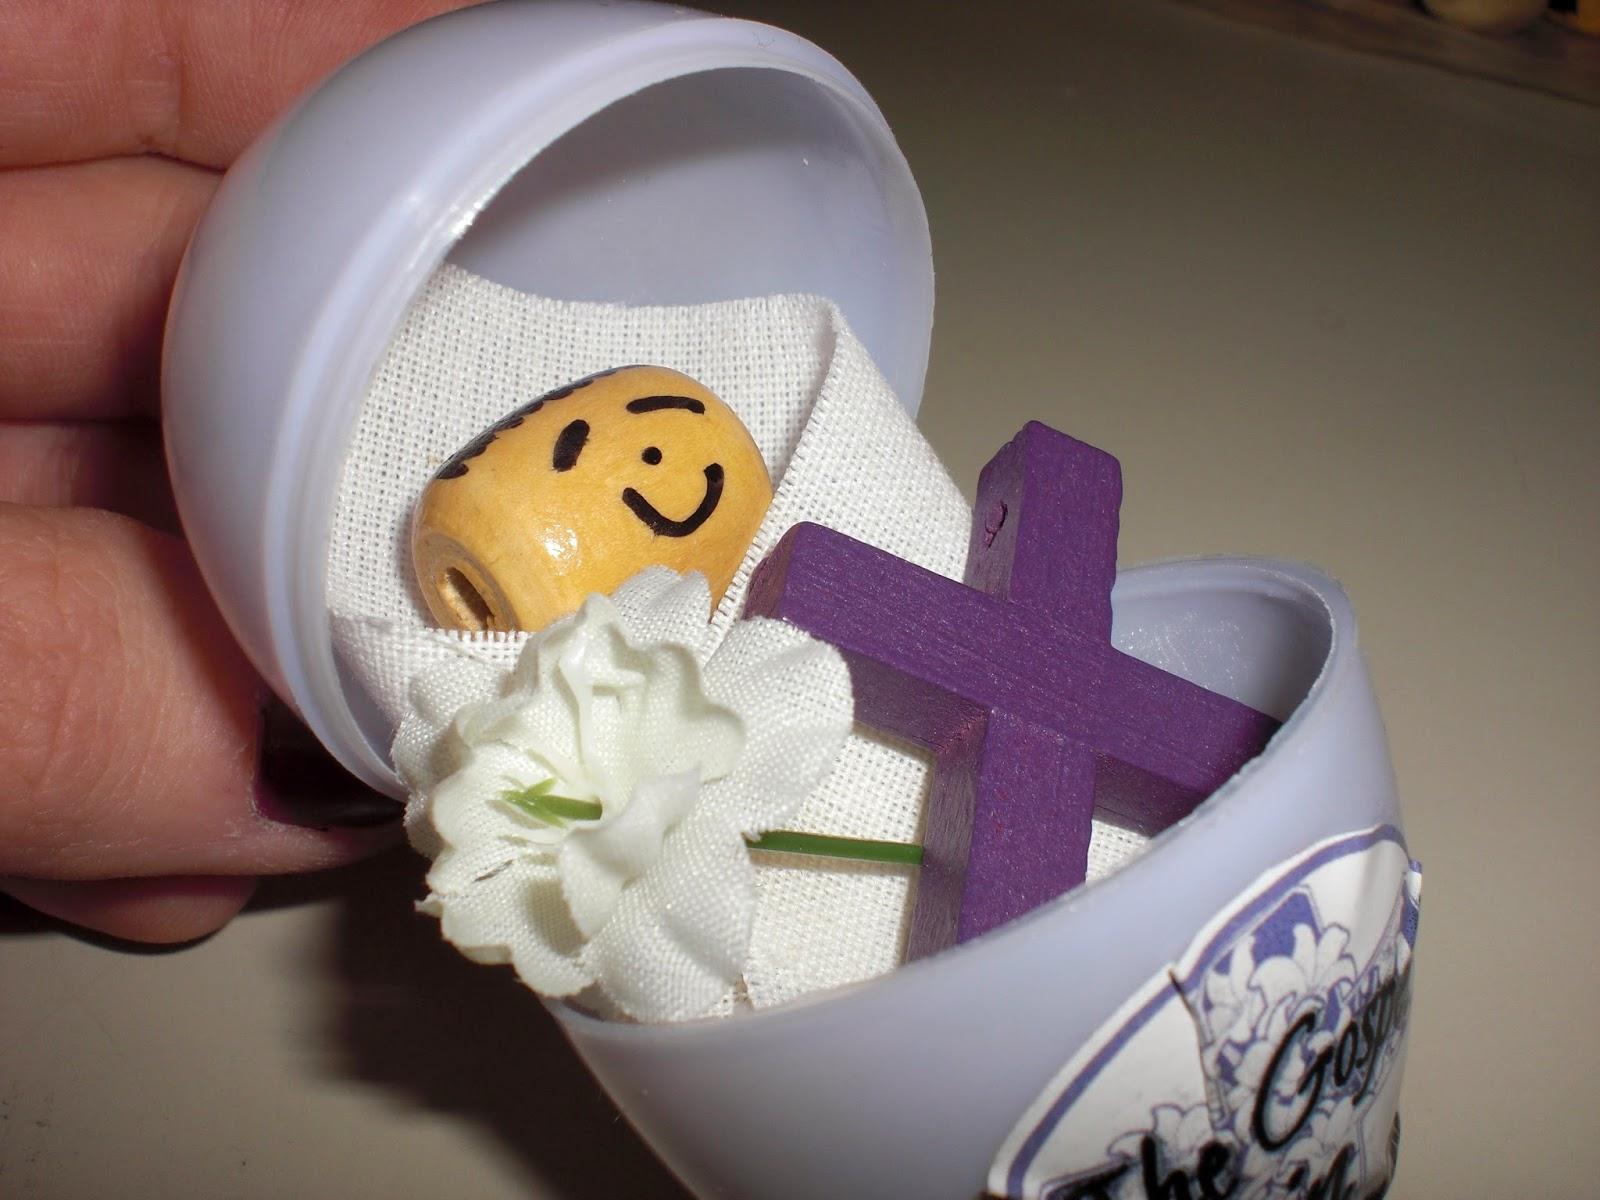 http://looktohimandberadiant.blogspot.com/2012/02/gospel-in-eggshell.html